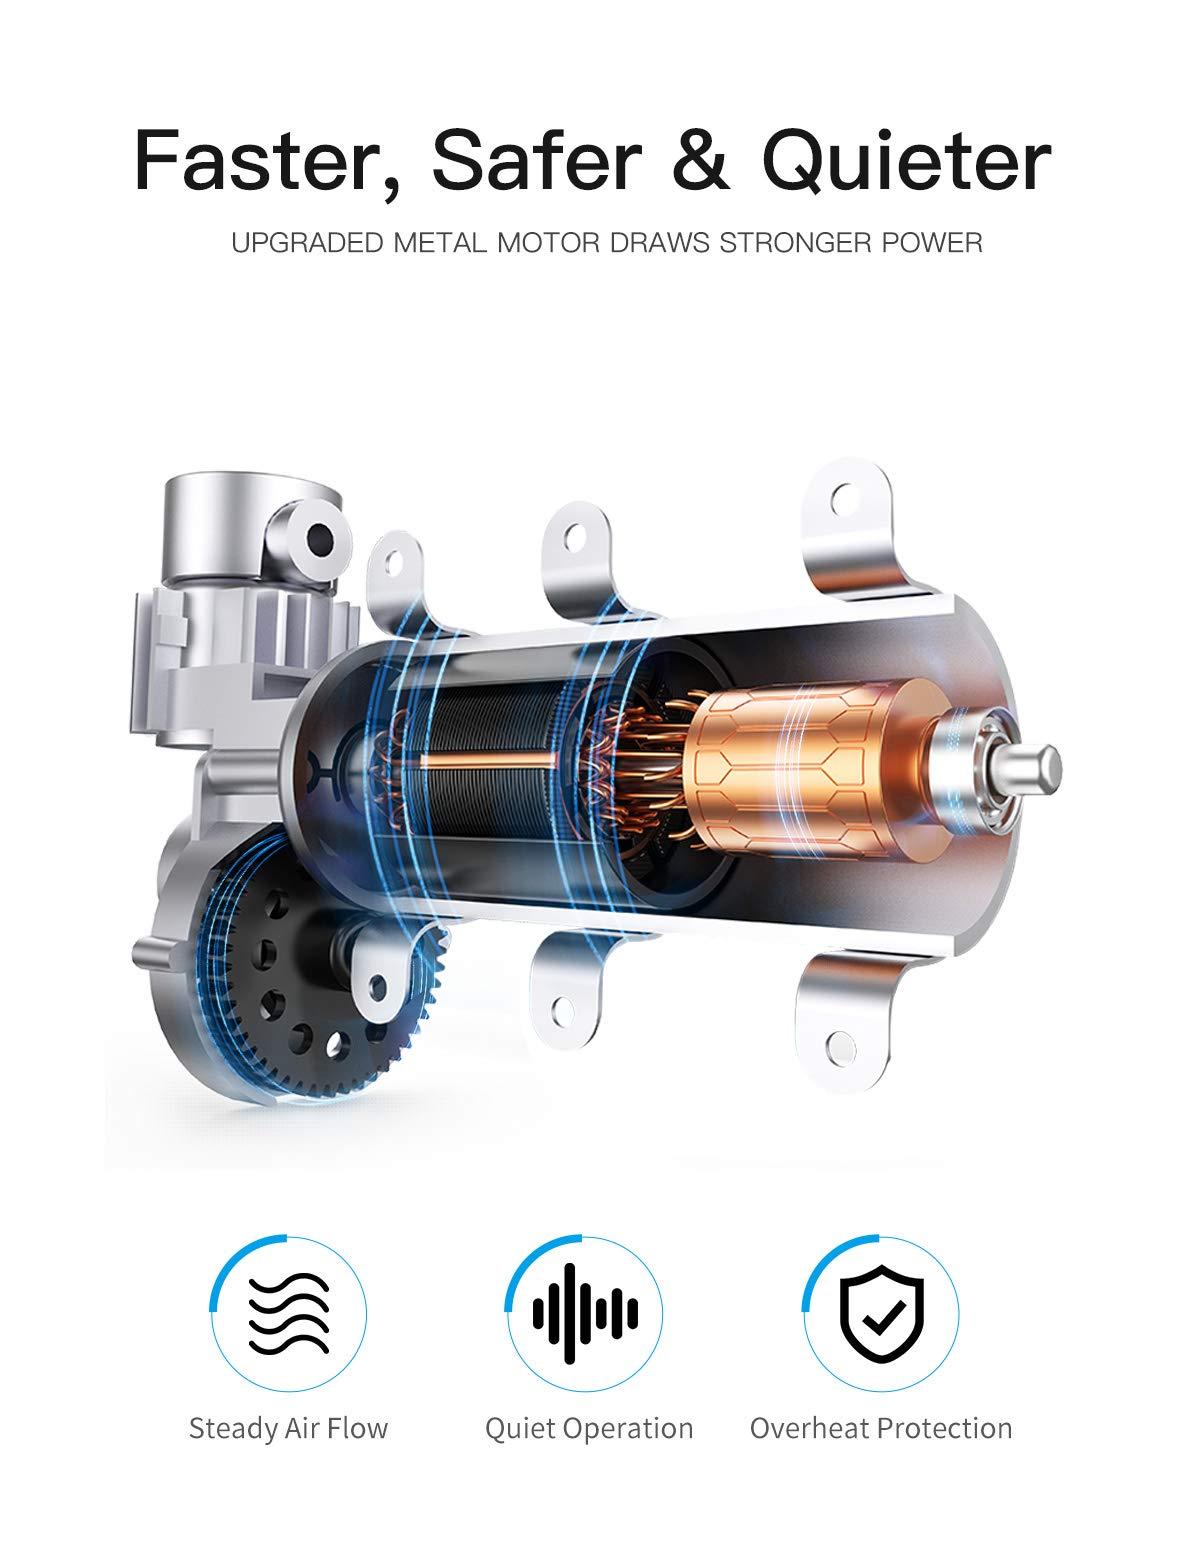 JOYROOM Portable Air Compressor Tire Inflator - Car Tire Pump with Digital Pressure Gauge (150 PSI 12V DC), Bright Emergency Flashlight - for Auto, Trucks, Bicycles, Balls by JOYROOM (Image #3)